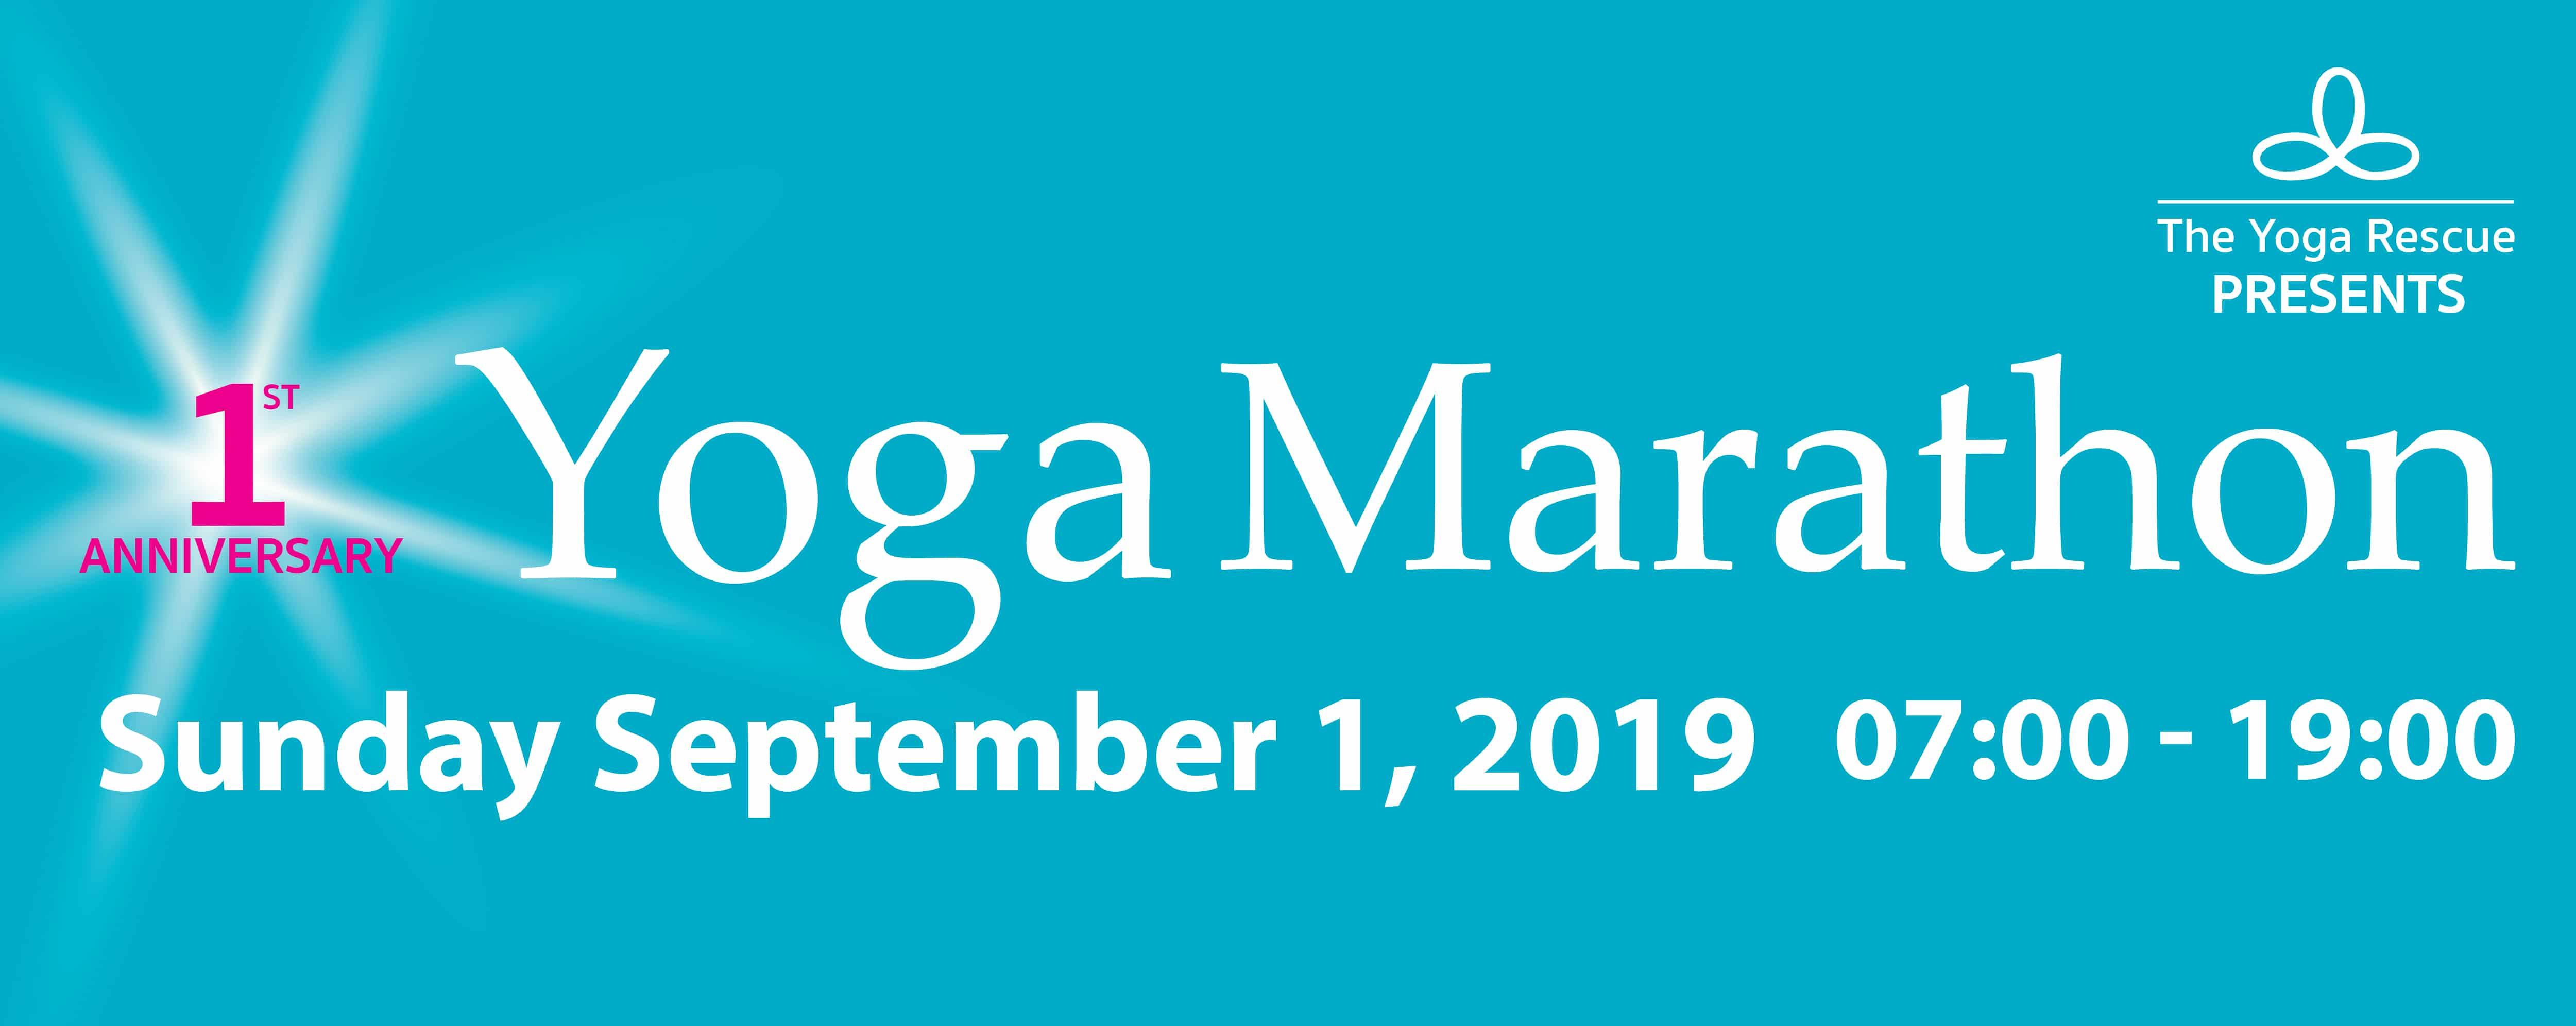 The Yoga Rescue - yoga marathon